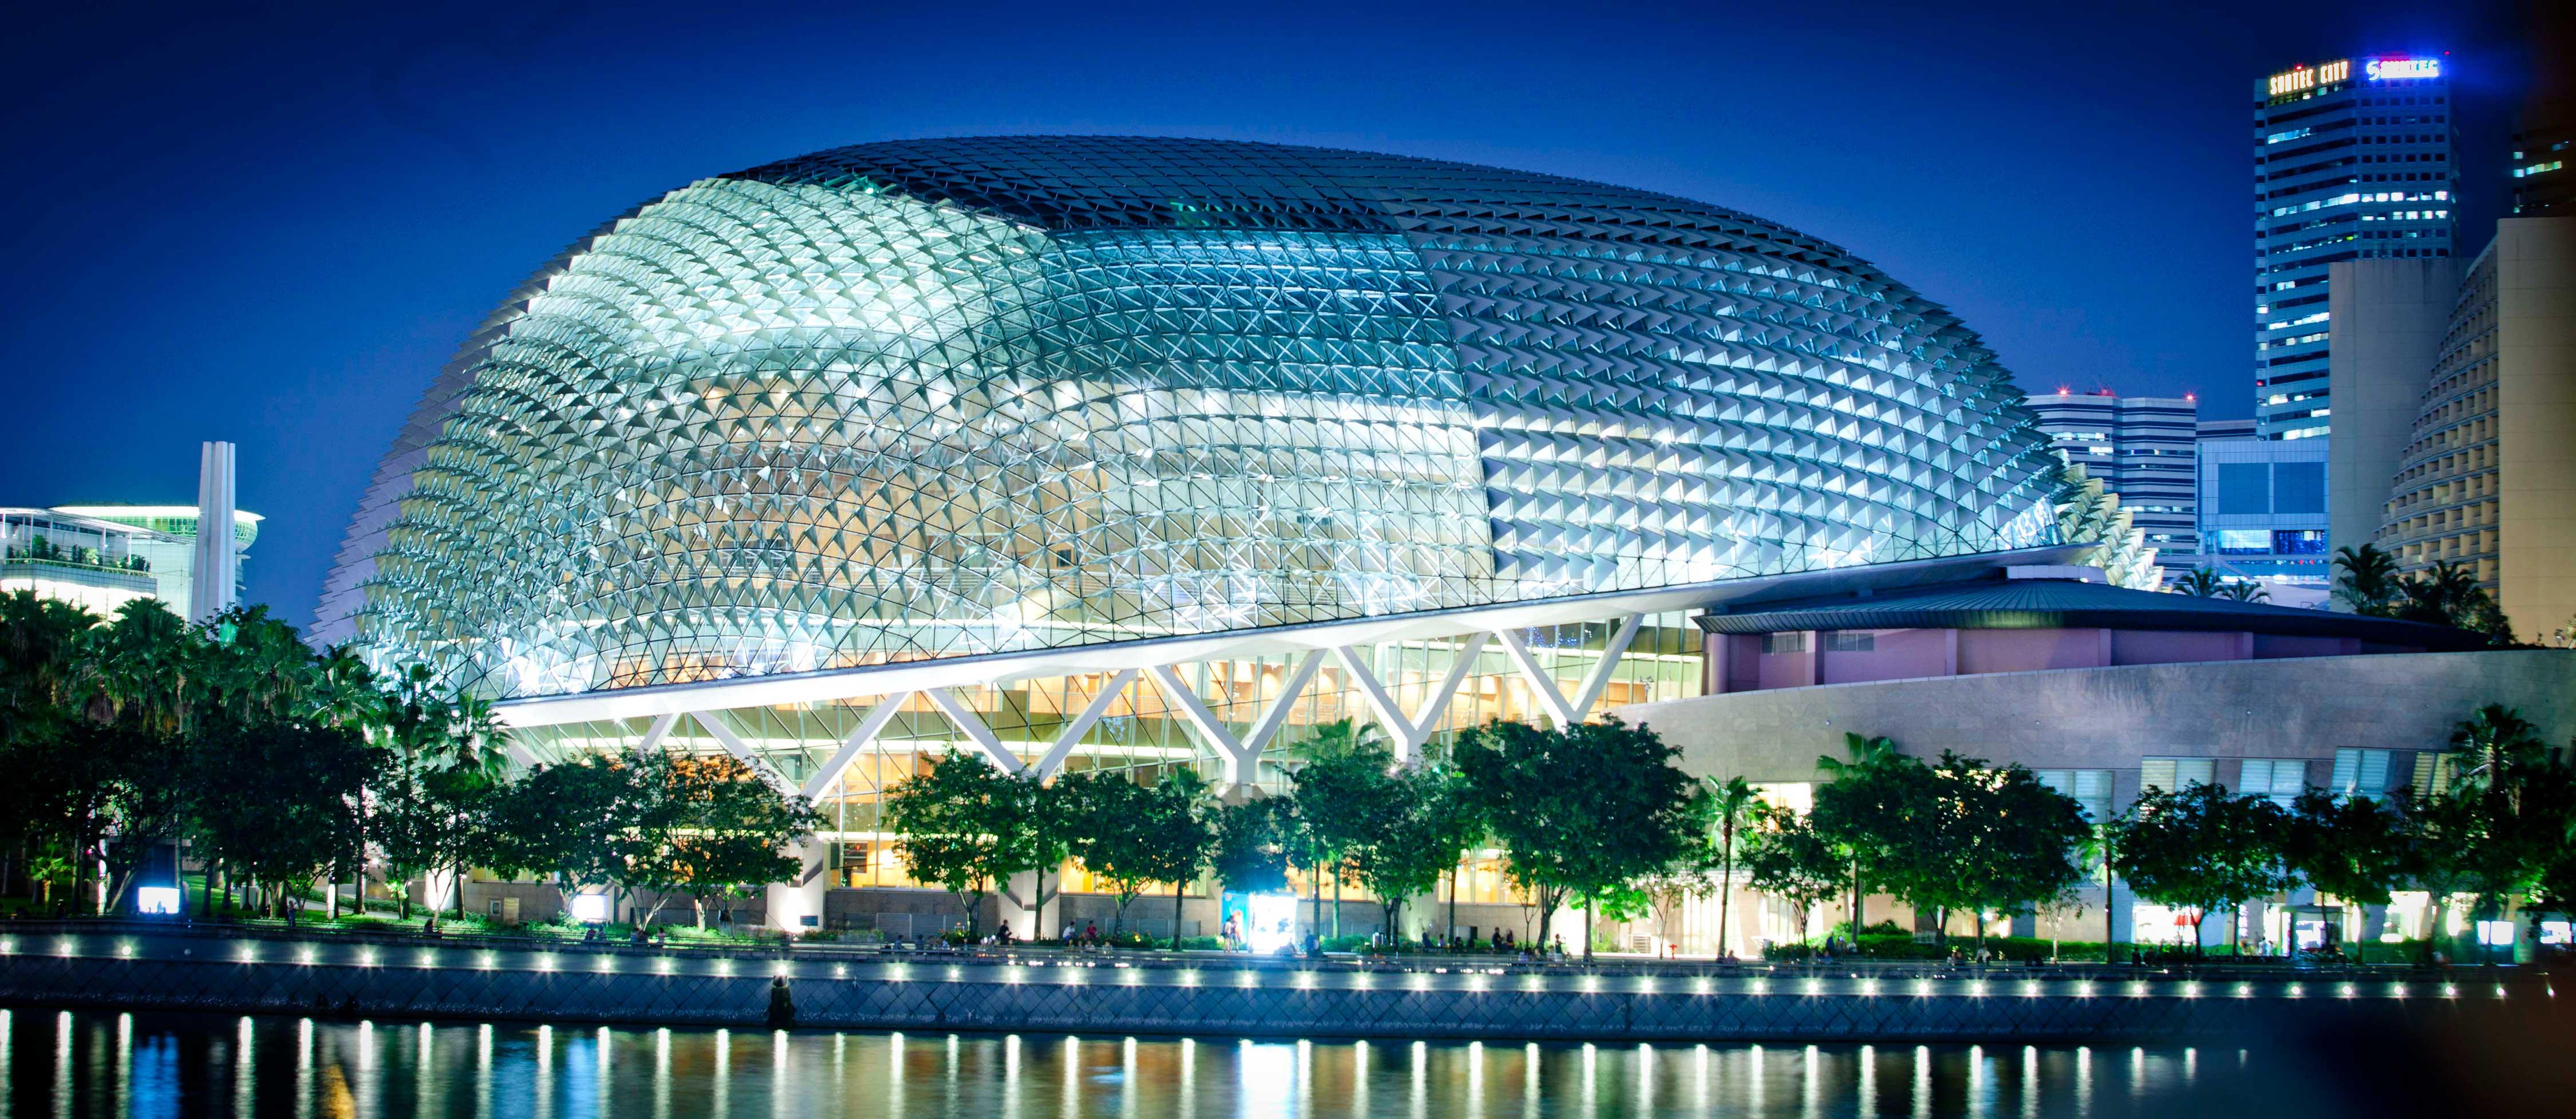 30th Neuro Week 2019 - Singapore City ,singapore